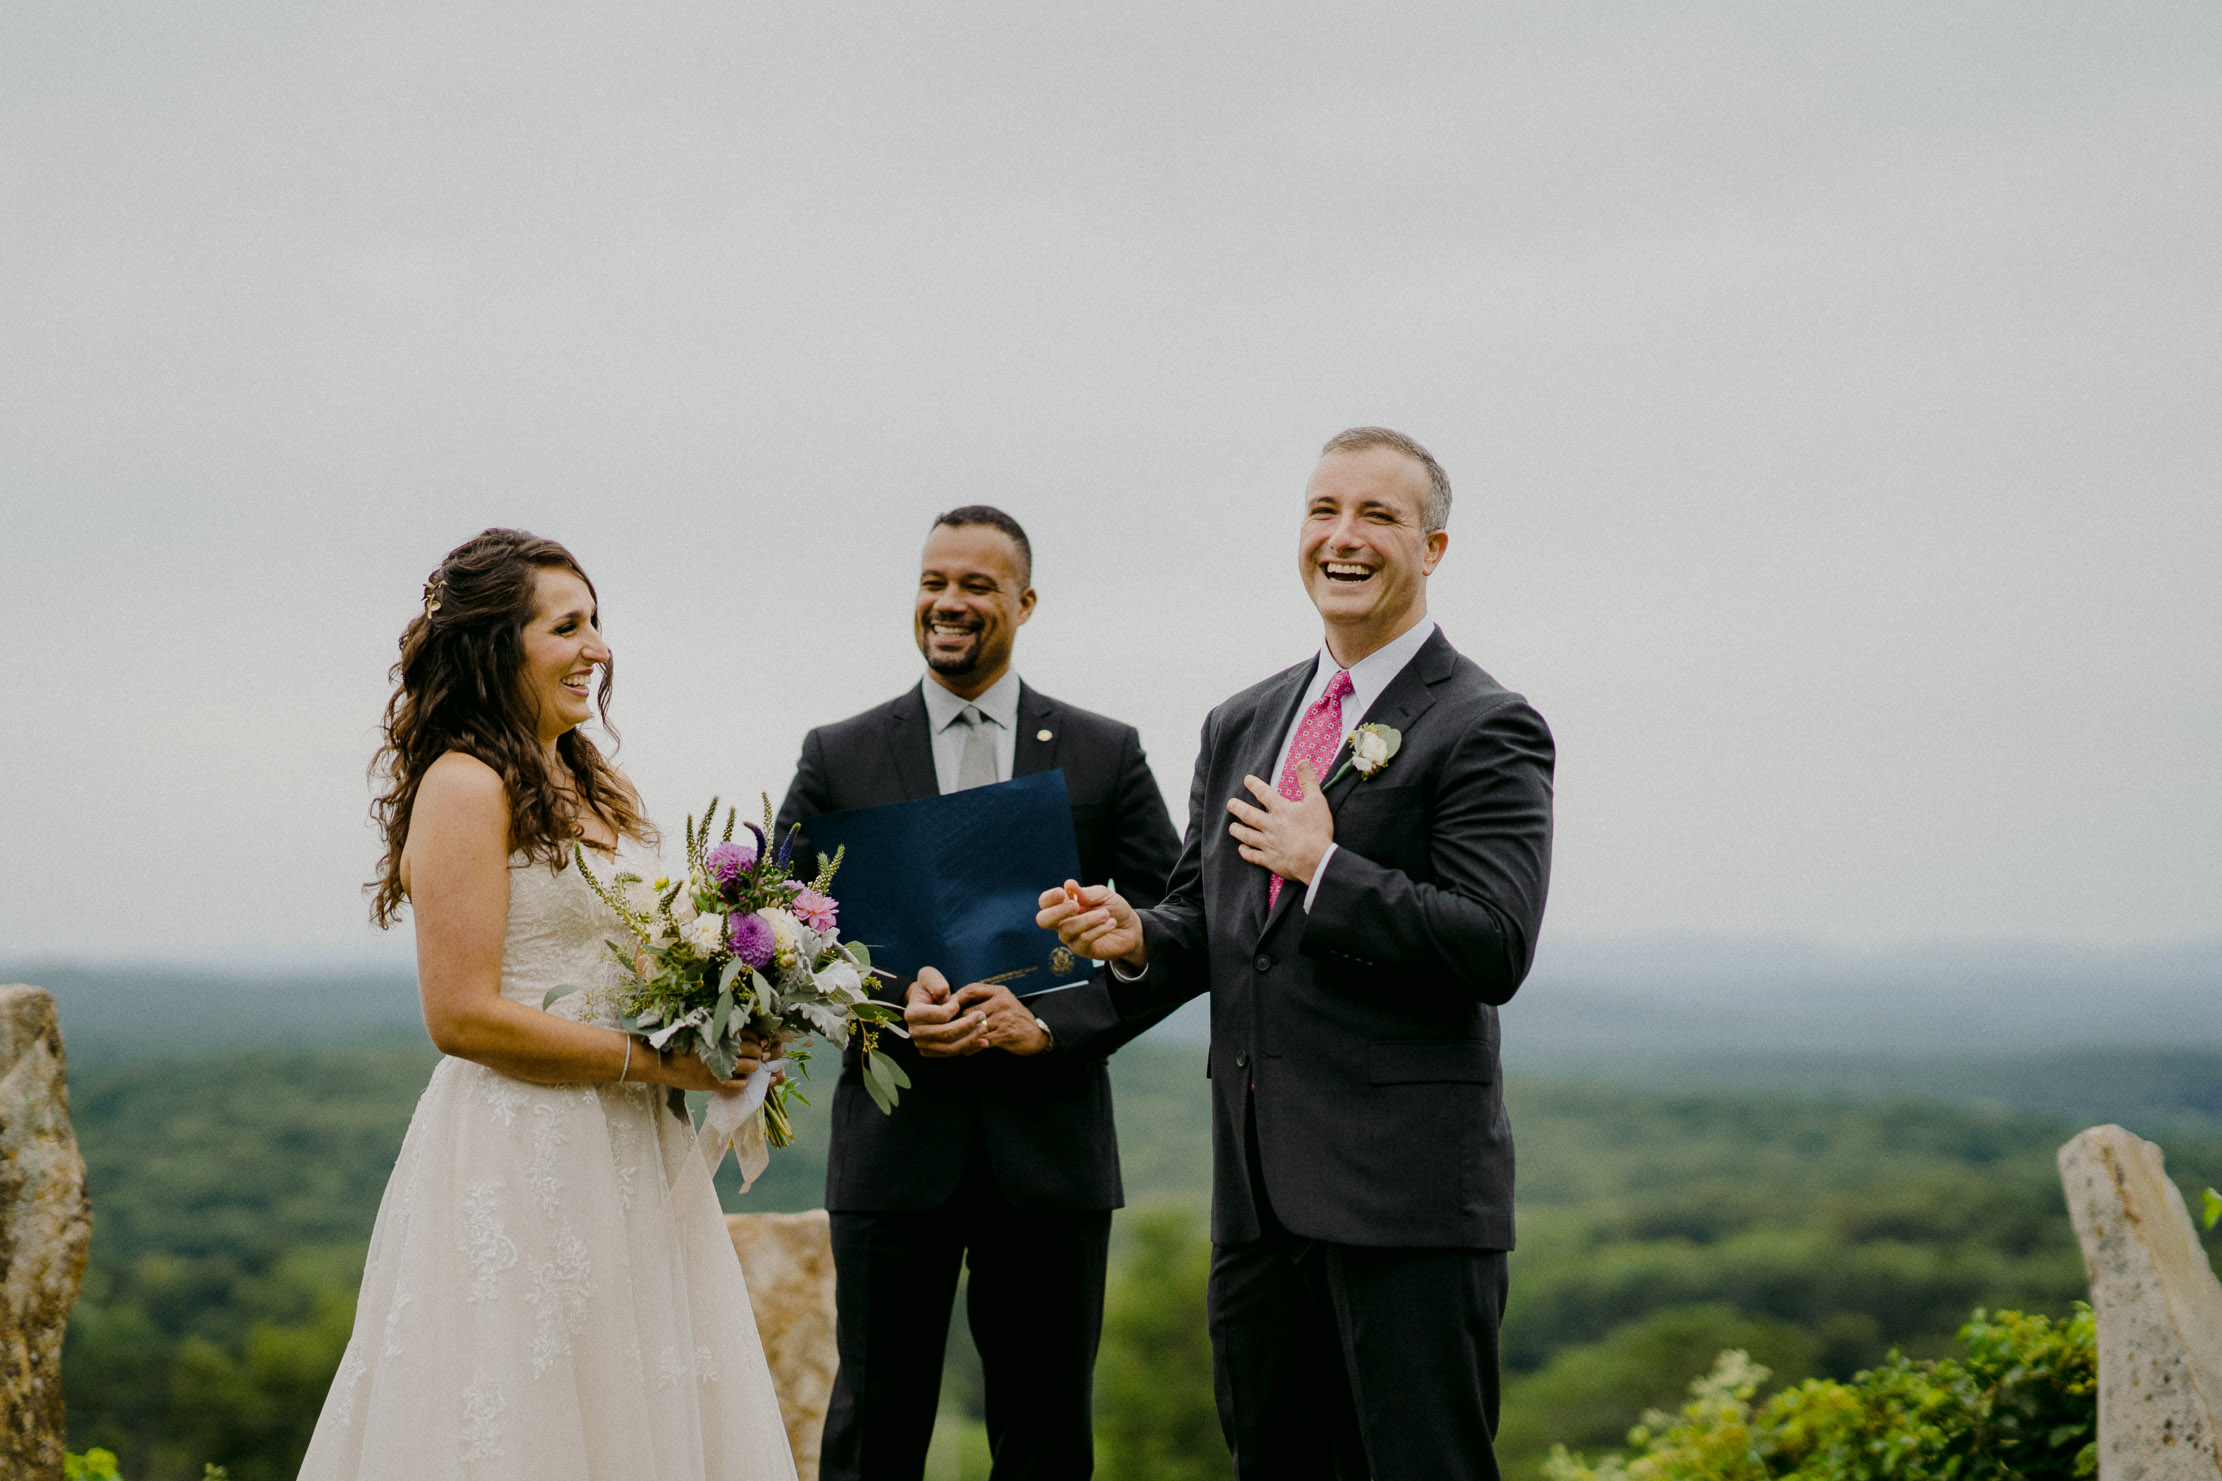 Wings-Castle-Millbrook-NY-Upstate-Wedding-Photographer-1087.jpg